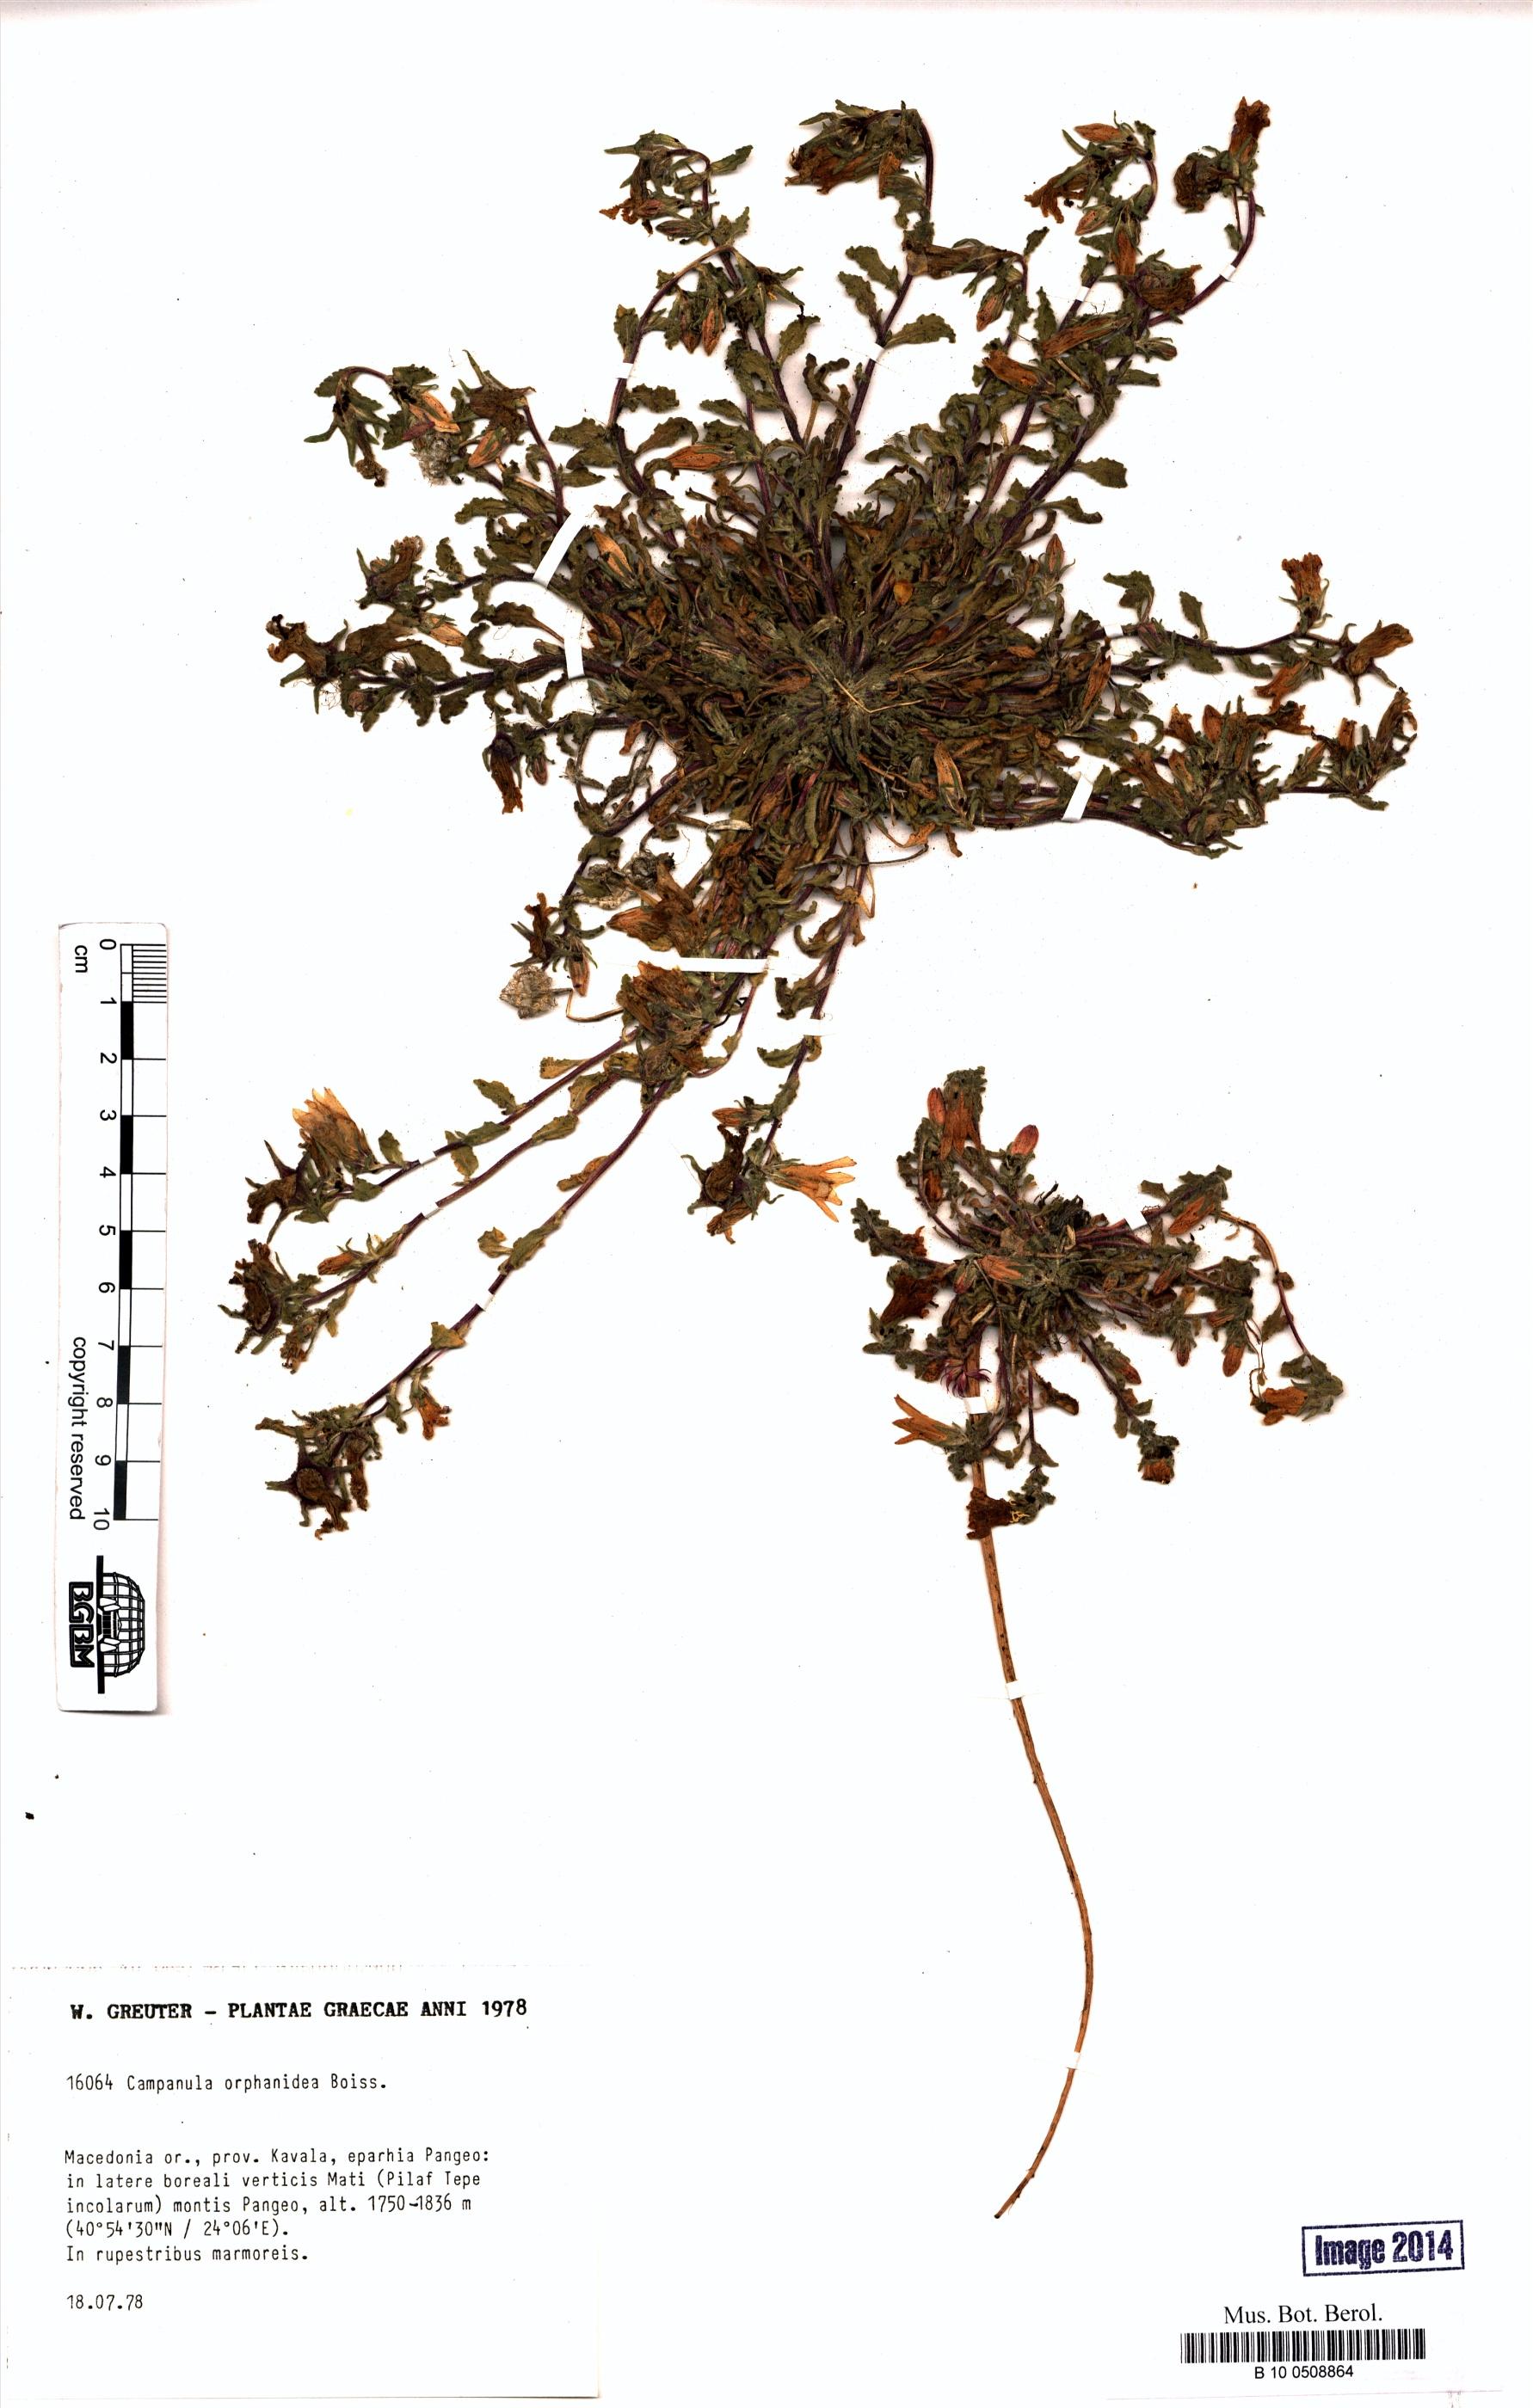 http://ww2.bgbm.org/herbarium/images/B/10/05/08/86/B_10_0508864.jpg